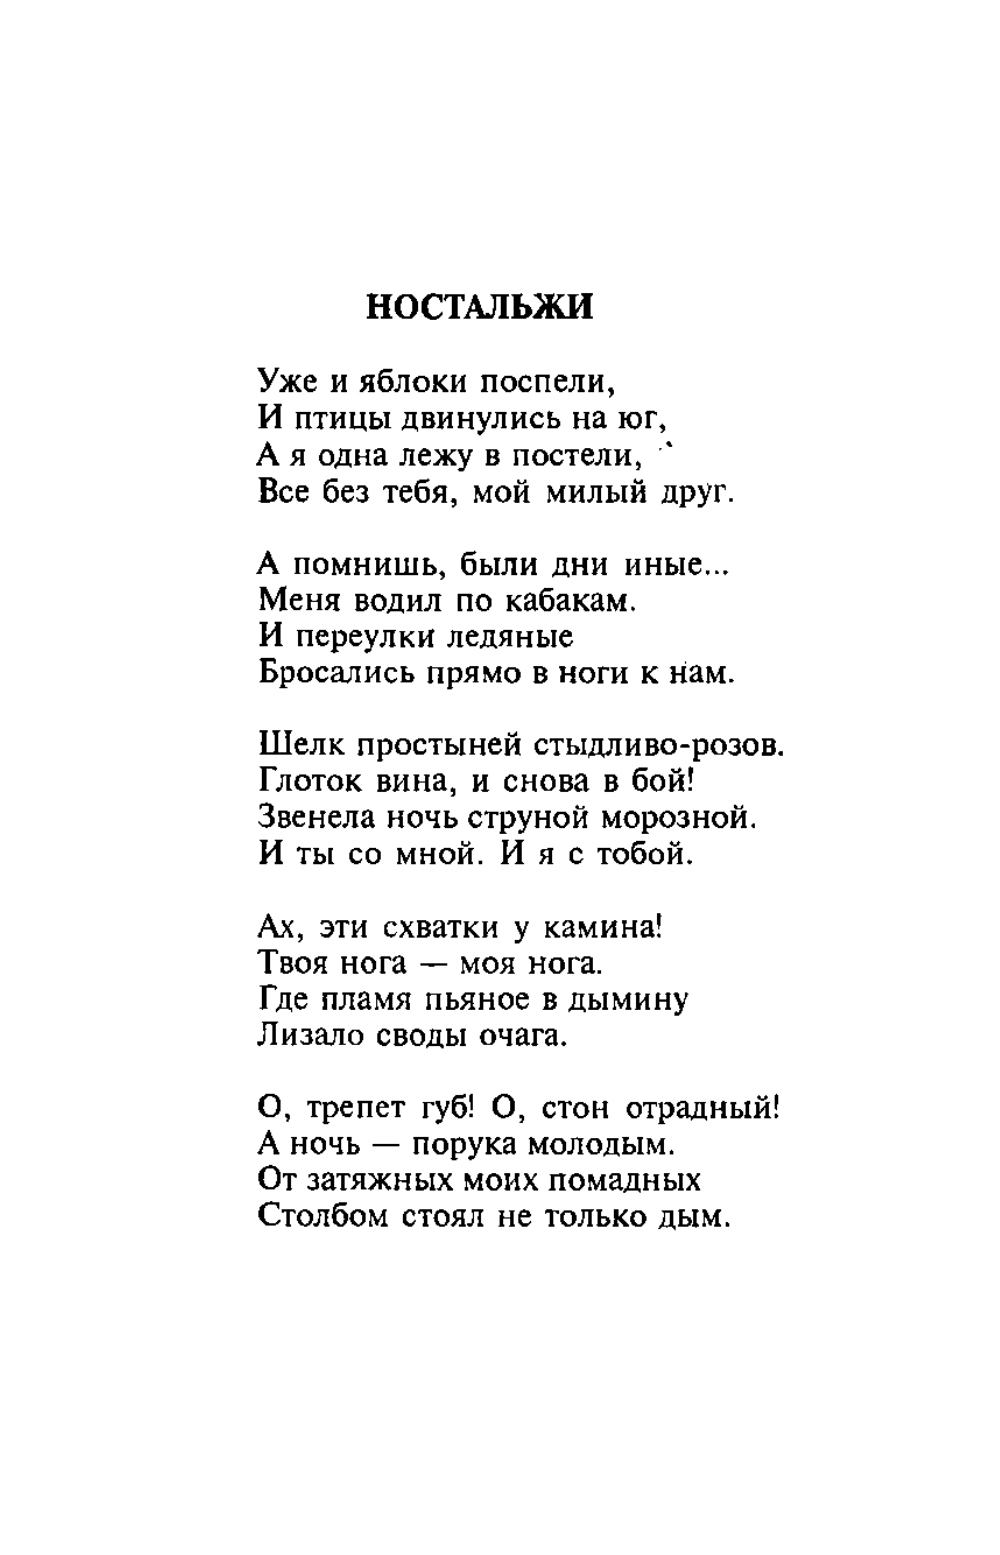 http://i5.imageban.ru/out/2013/11/15/03ae1f1d44dccd4811ad8c3915307e99.jpg